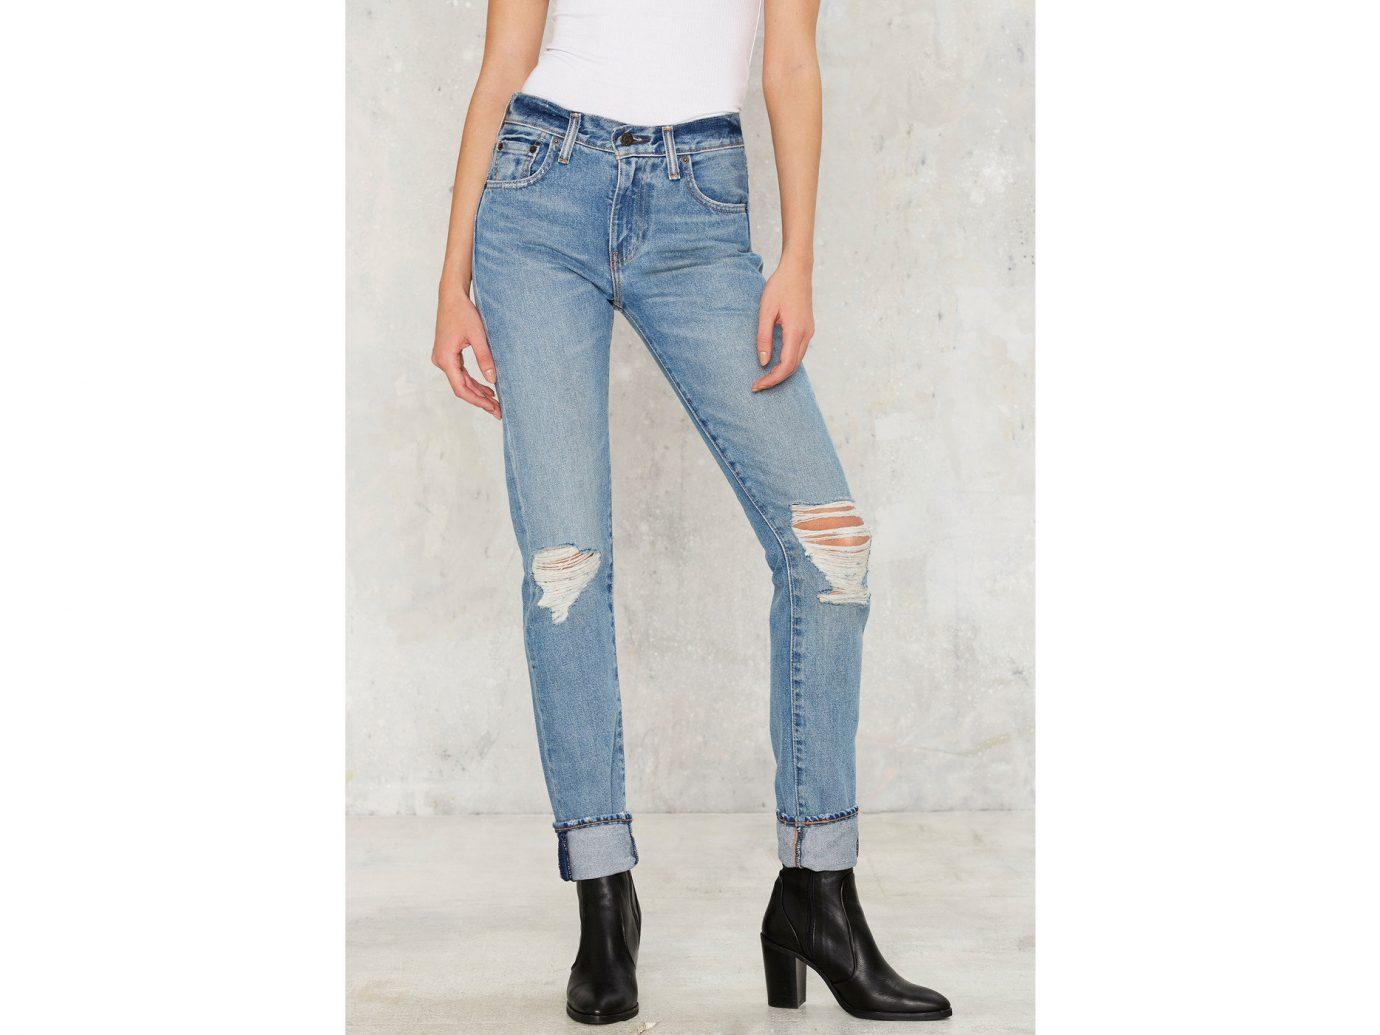 Style + Design jeans person clothing denim trousers pocket trouser abdomen textile sleeve pattern posing